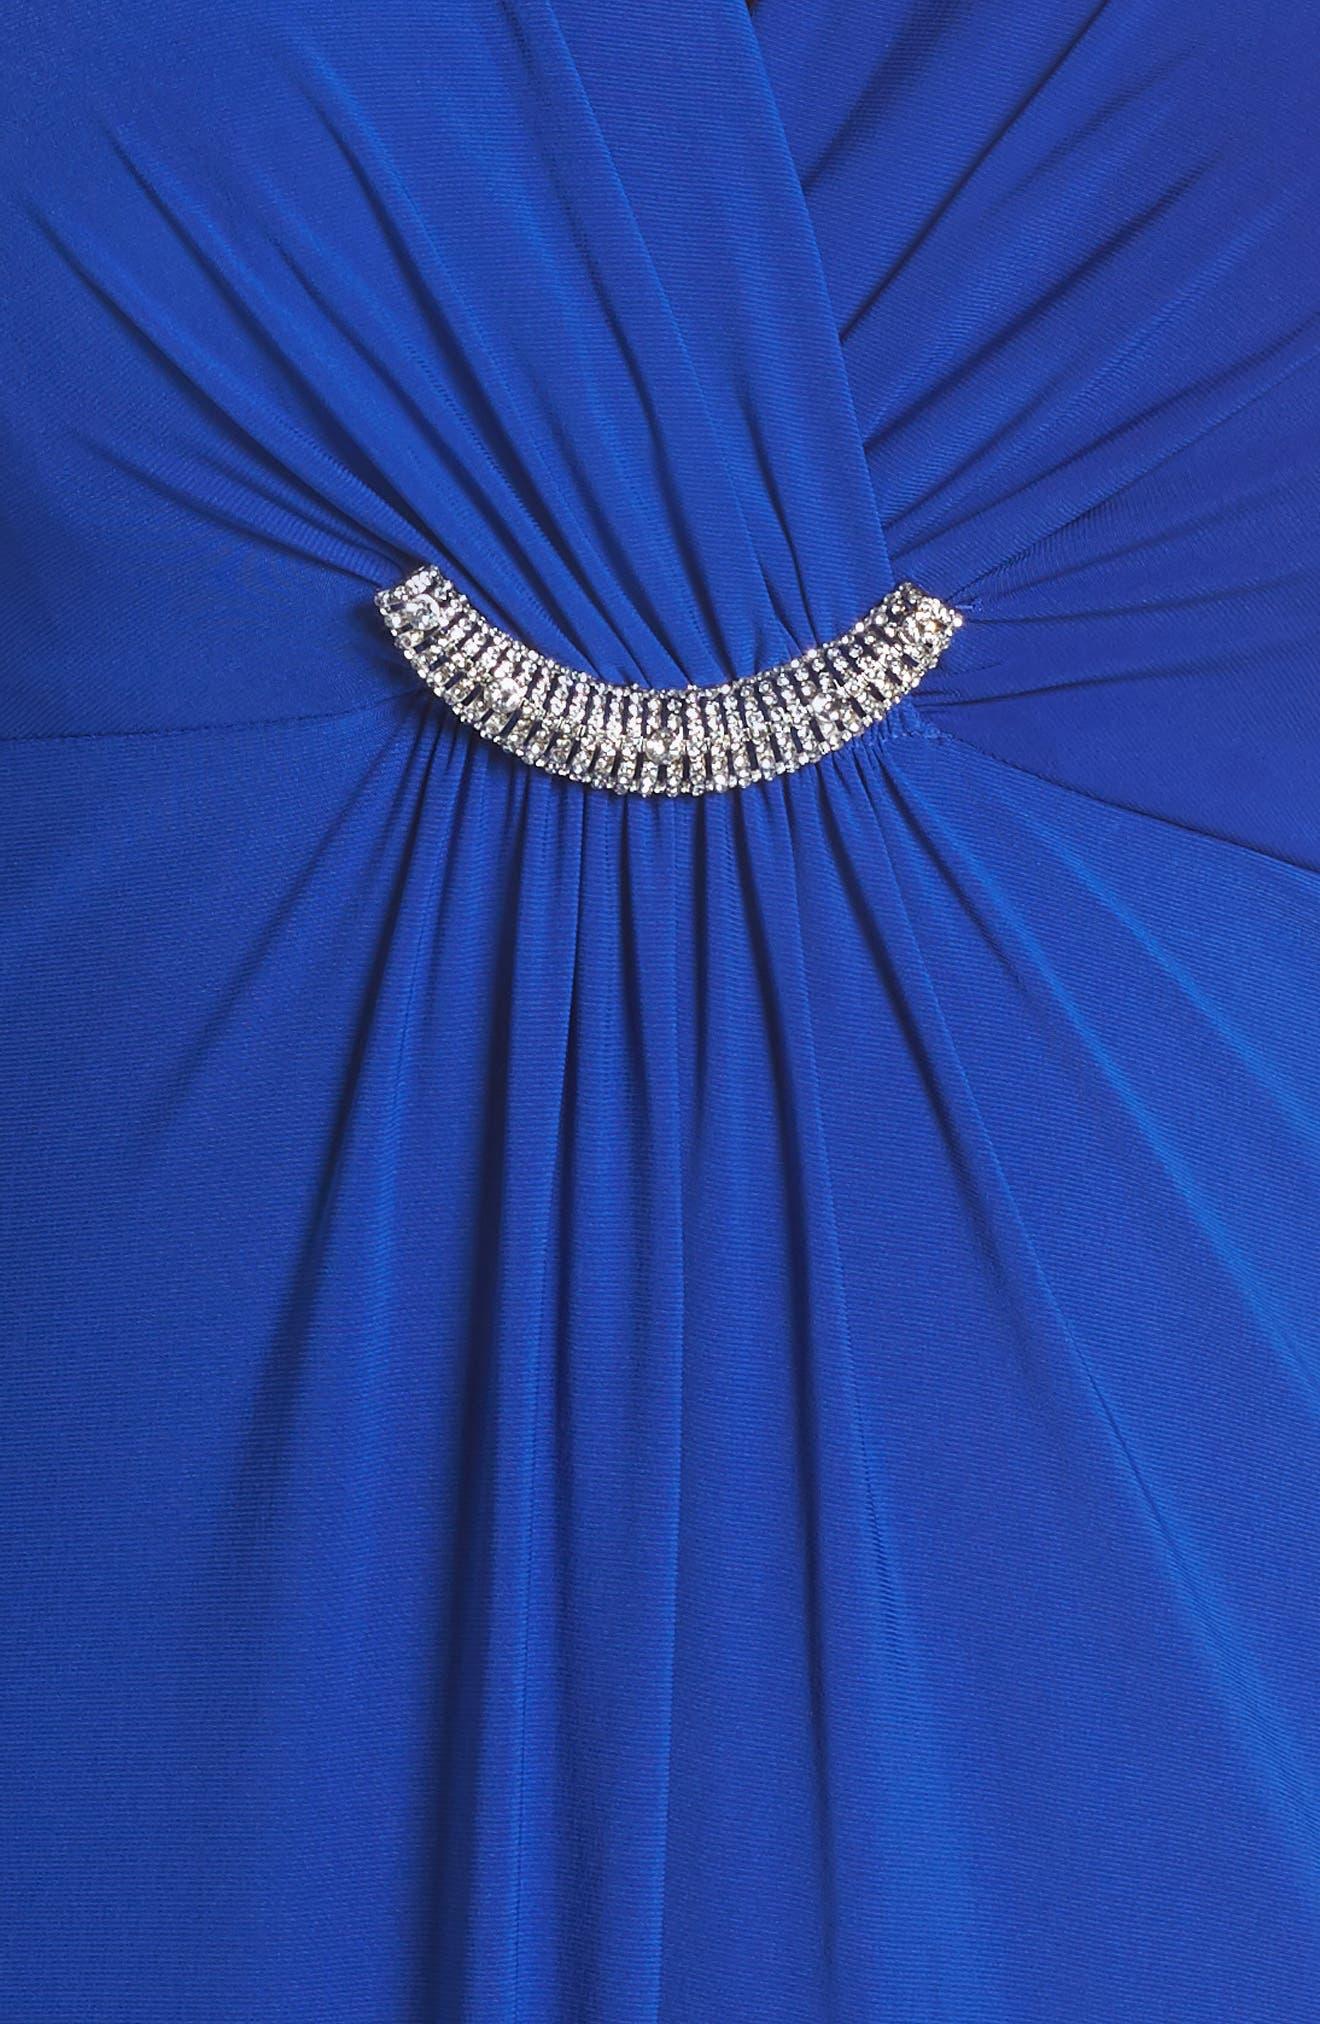 Embellished Surplice Dress,                             Alternate thumbnail 4, color,                             430